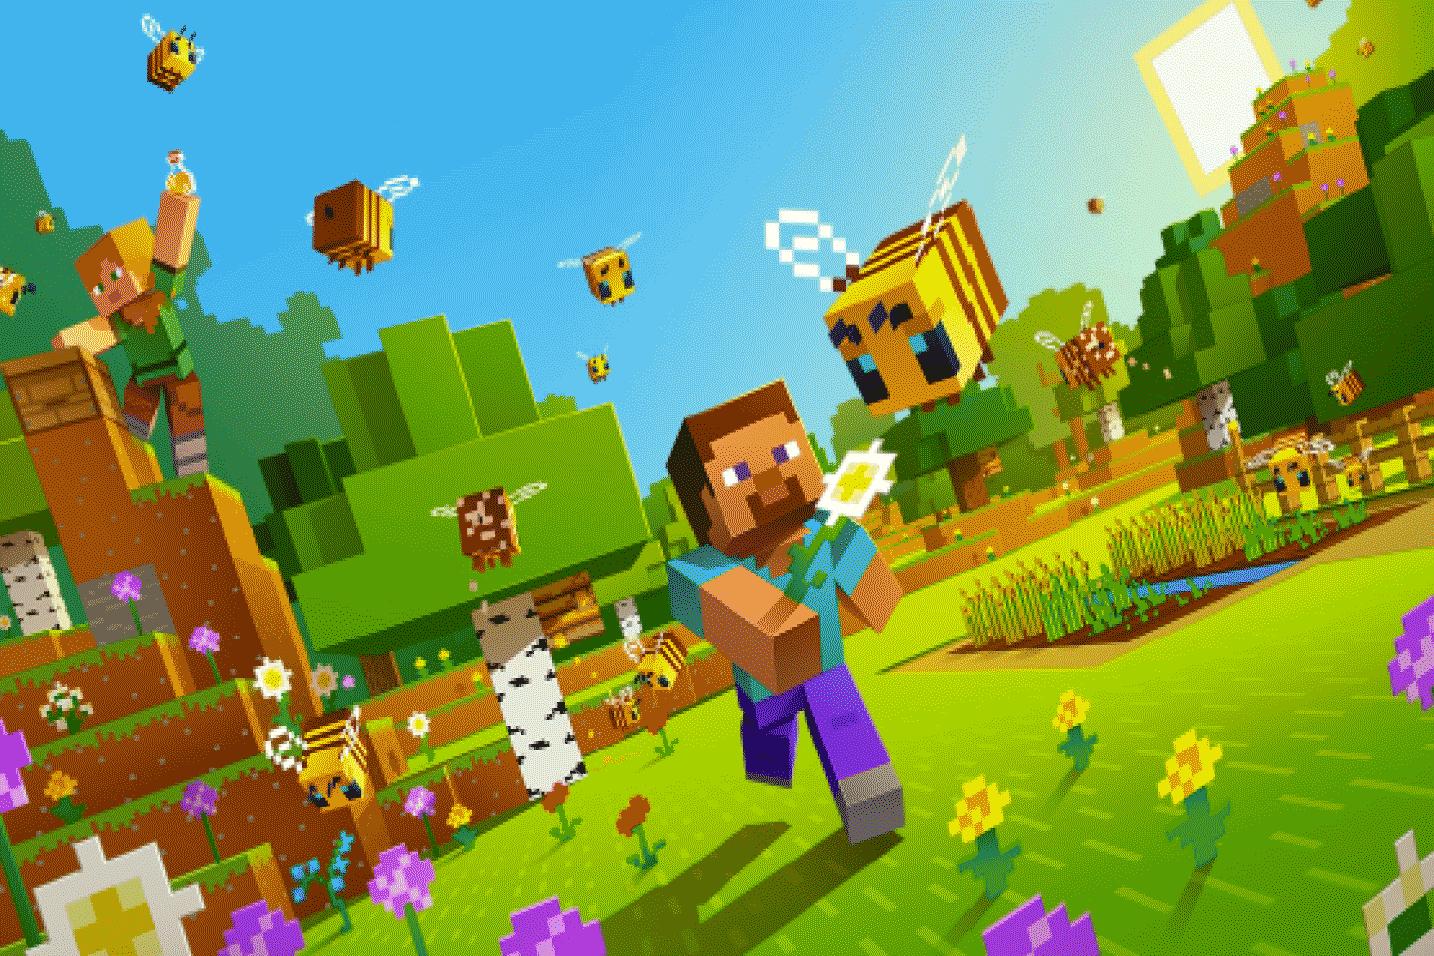 Minecraft world - characters running around outside